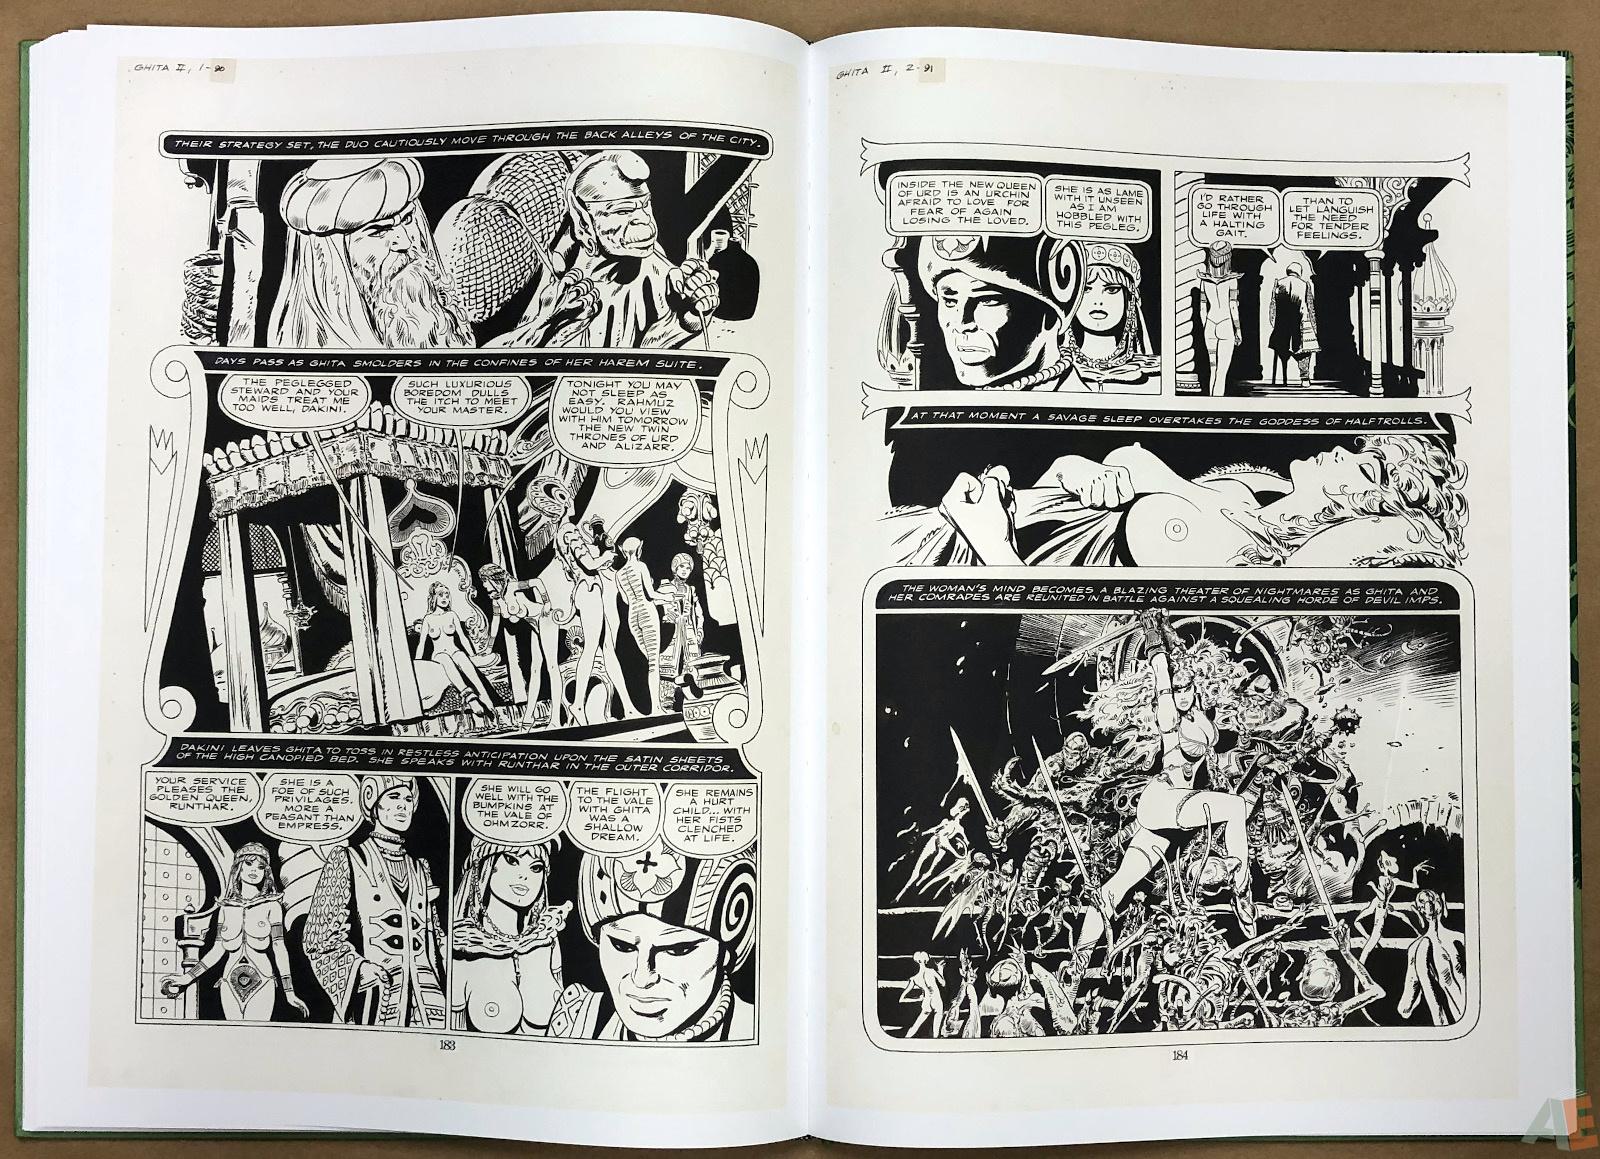 Frank Thorne's Ghita: An Erotic Treasury Volume II